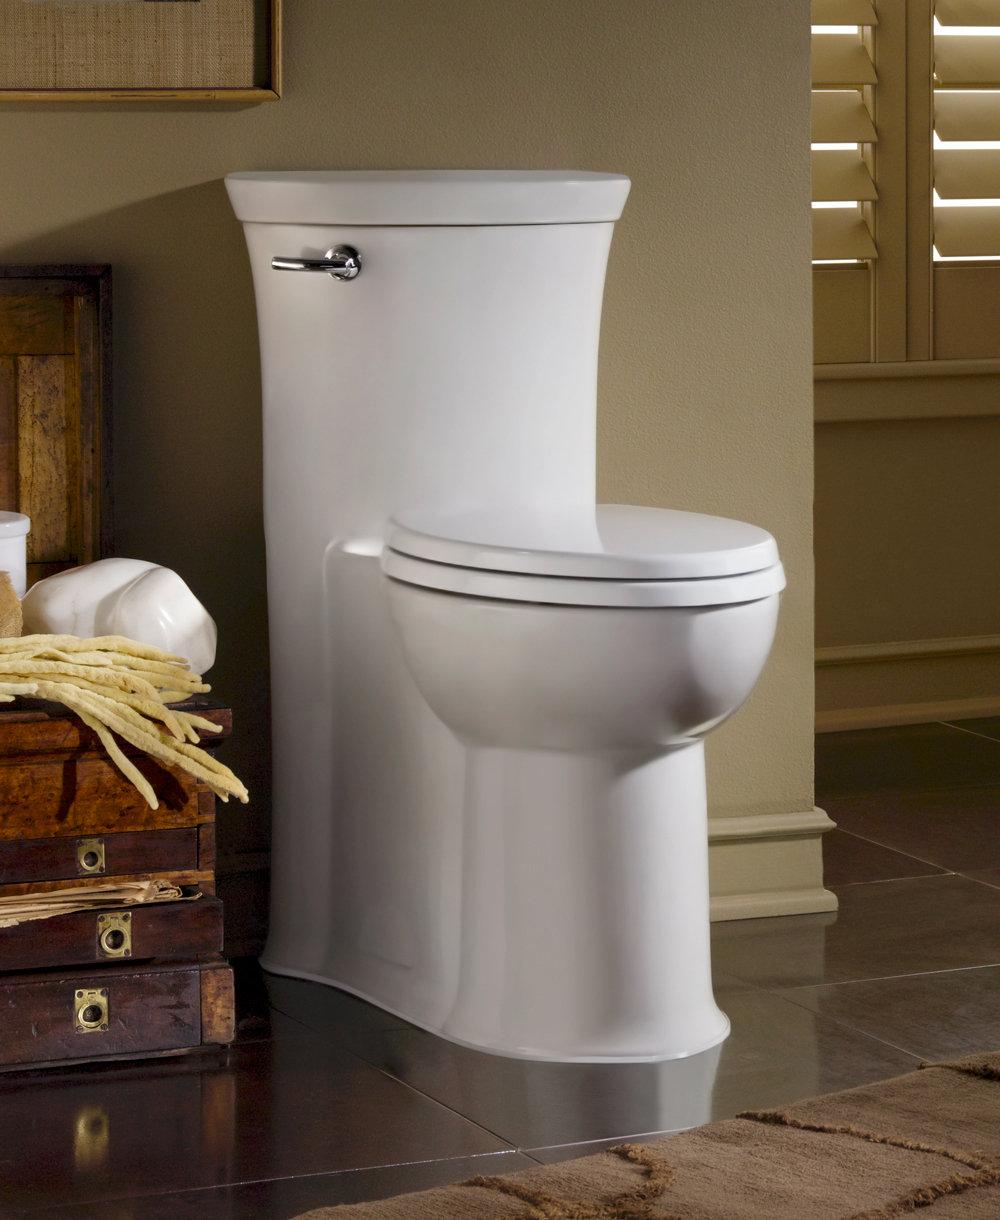 10 Inch Rough Toilet